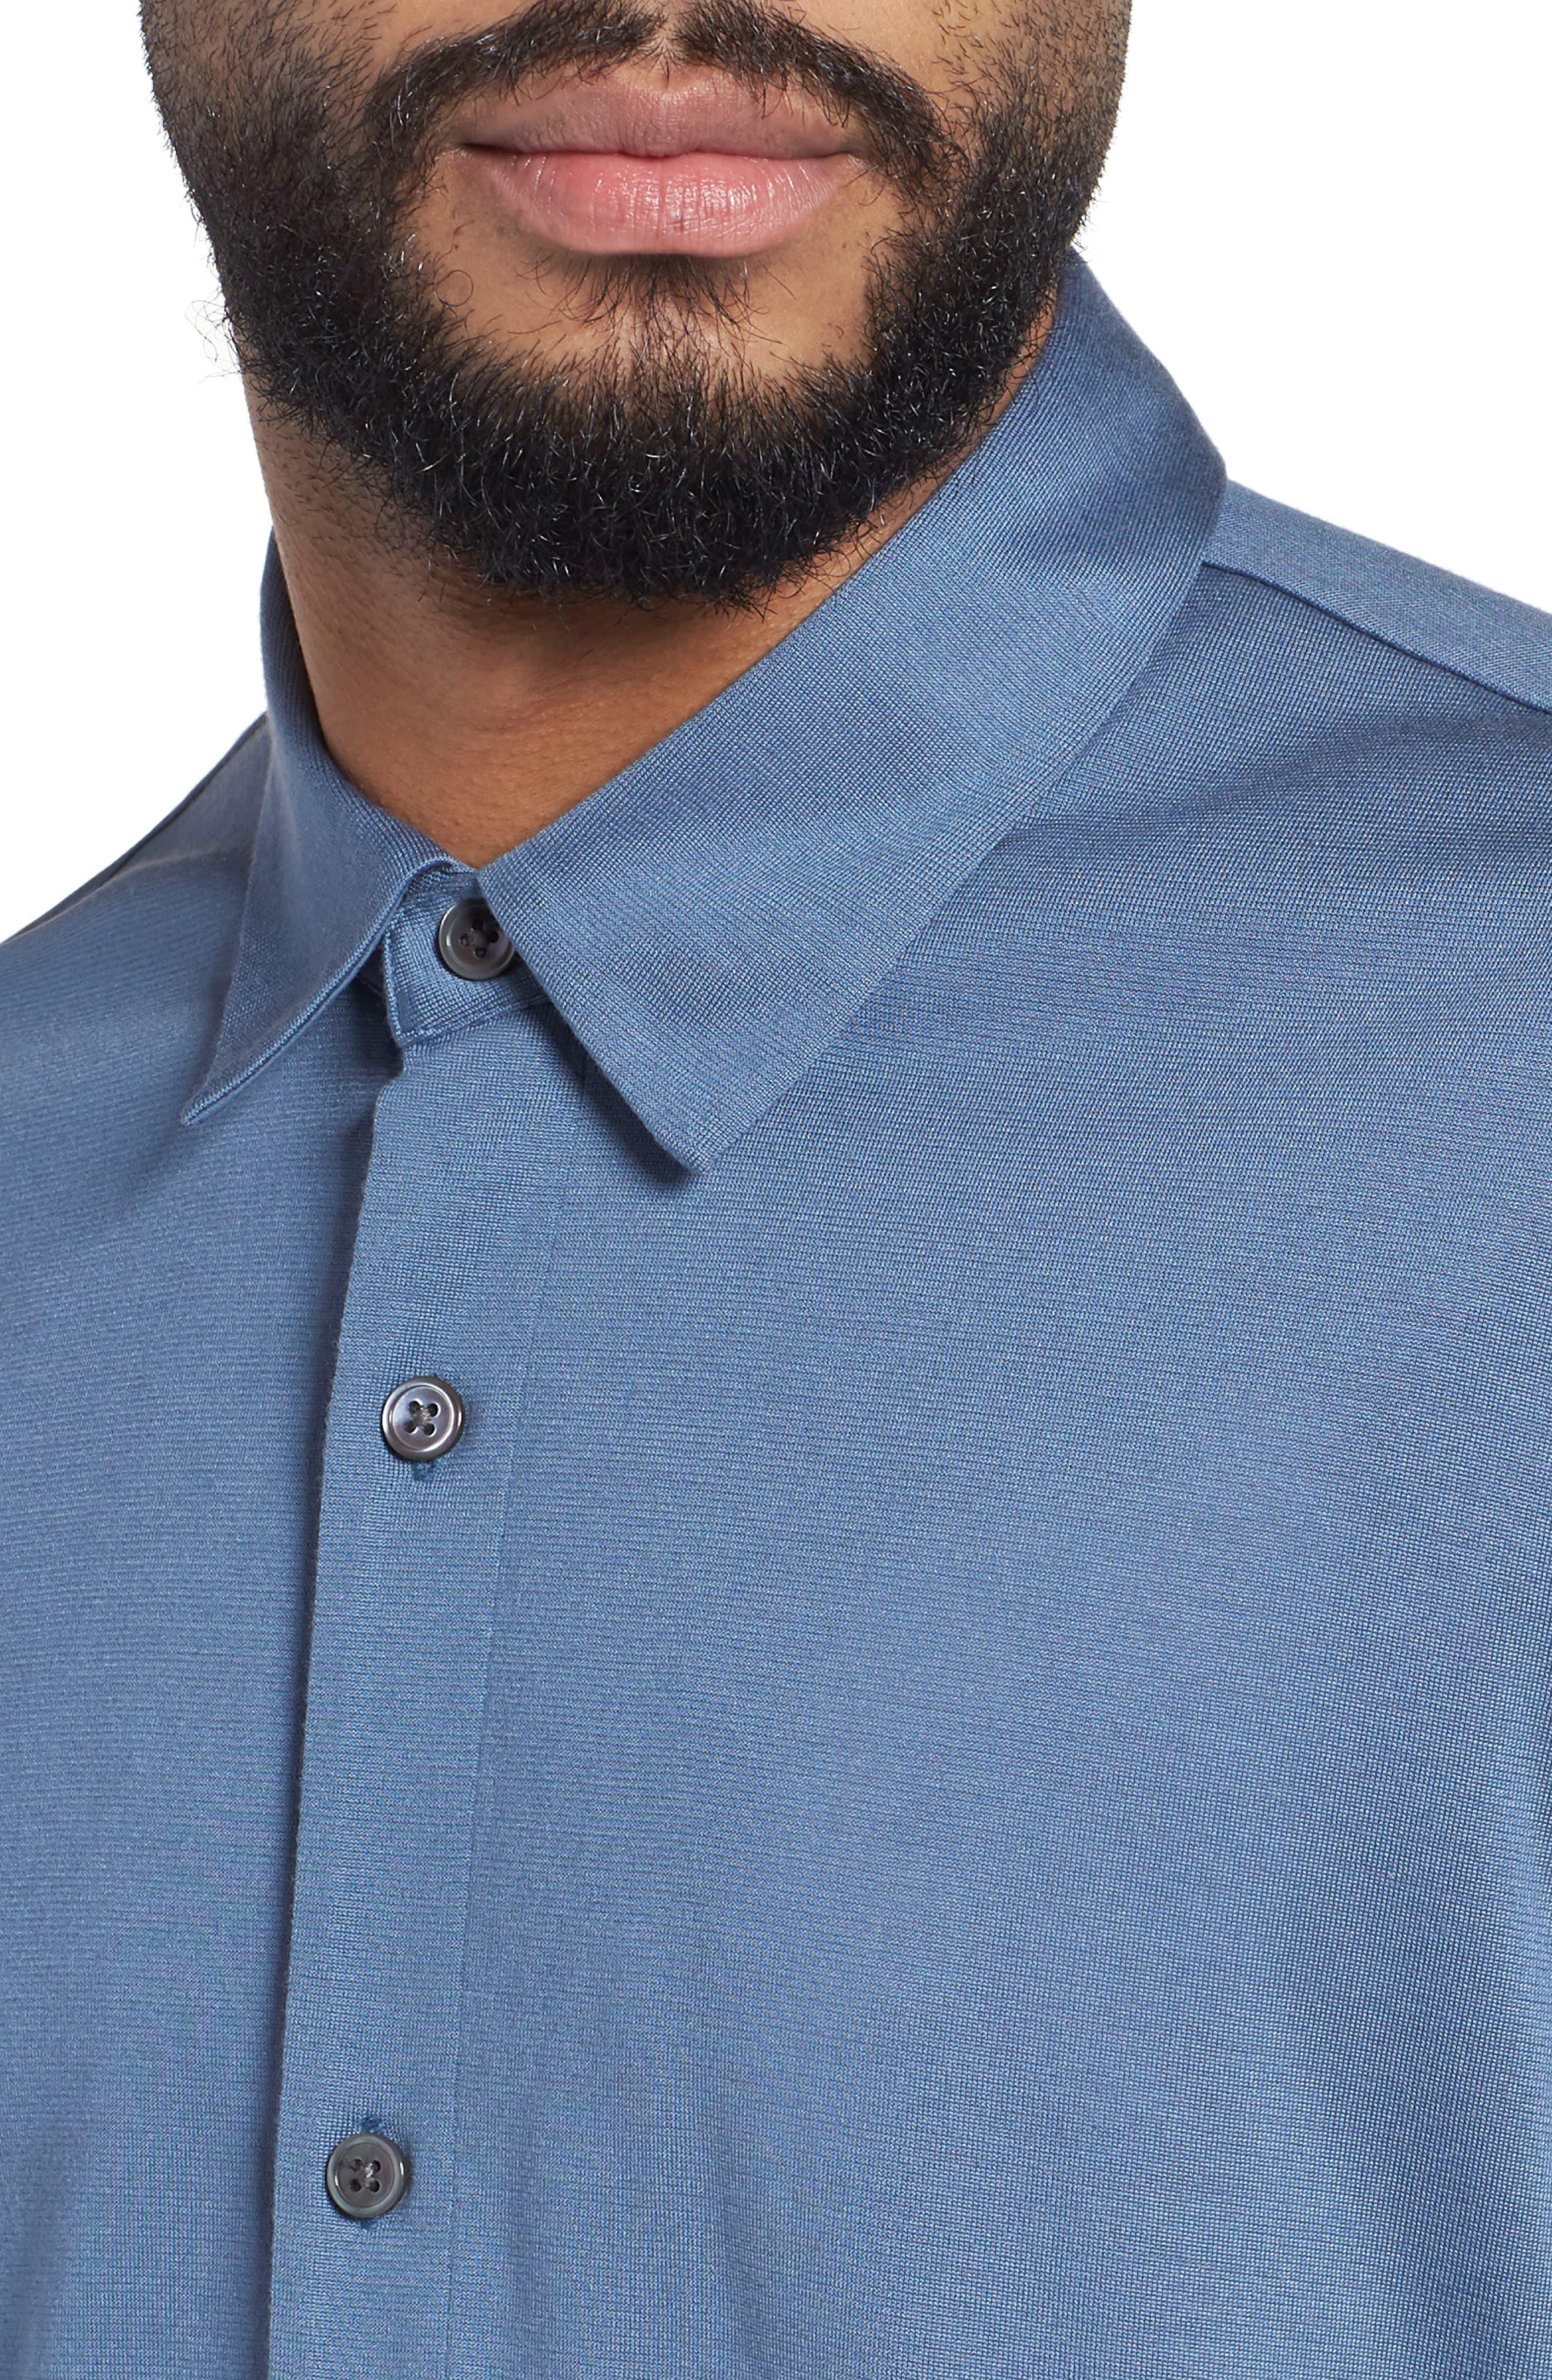 Incisive Silk & Cotton Short Sleeve Sport Shirt,                             Alternate thumbnail 4, color,                             Iris